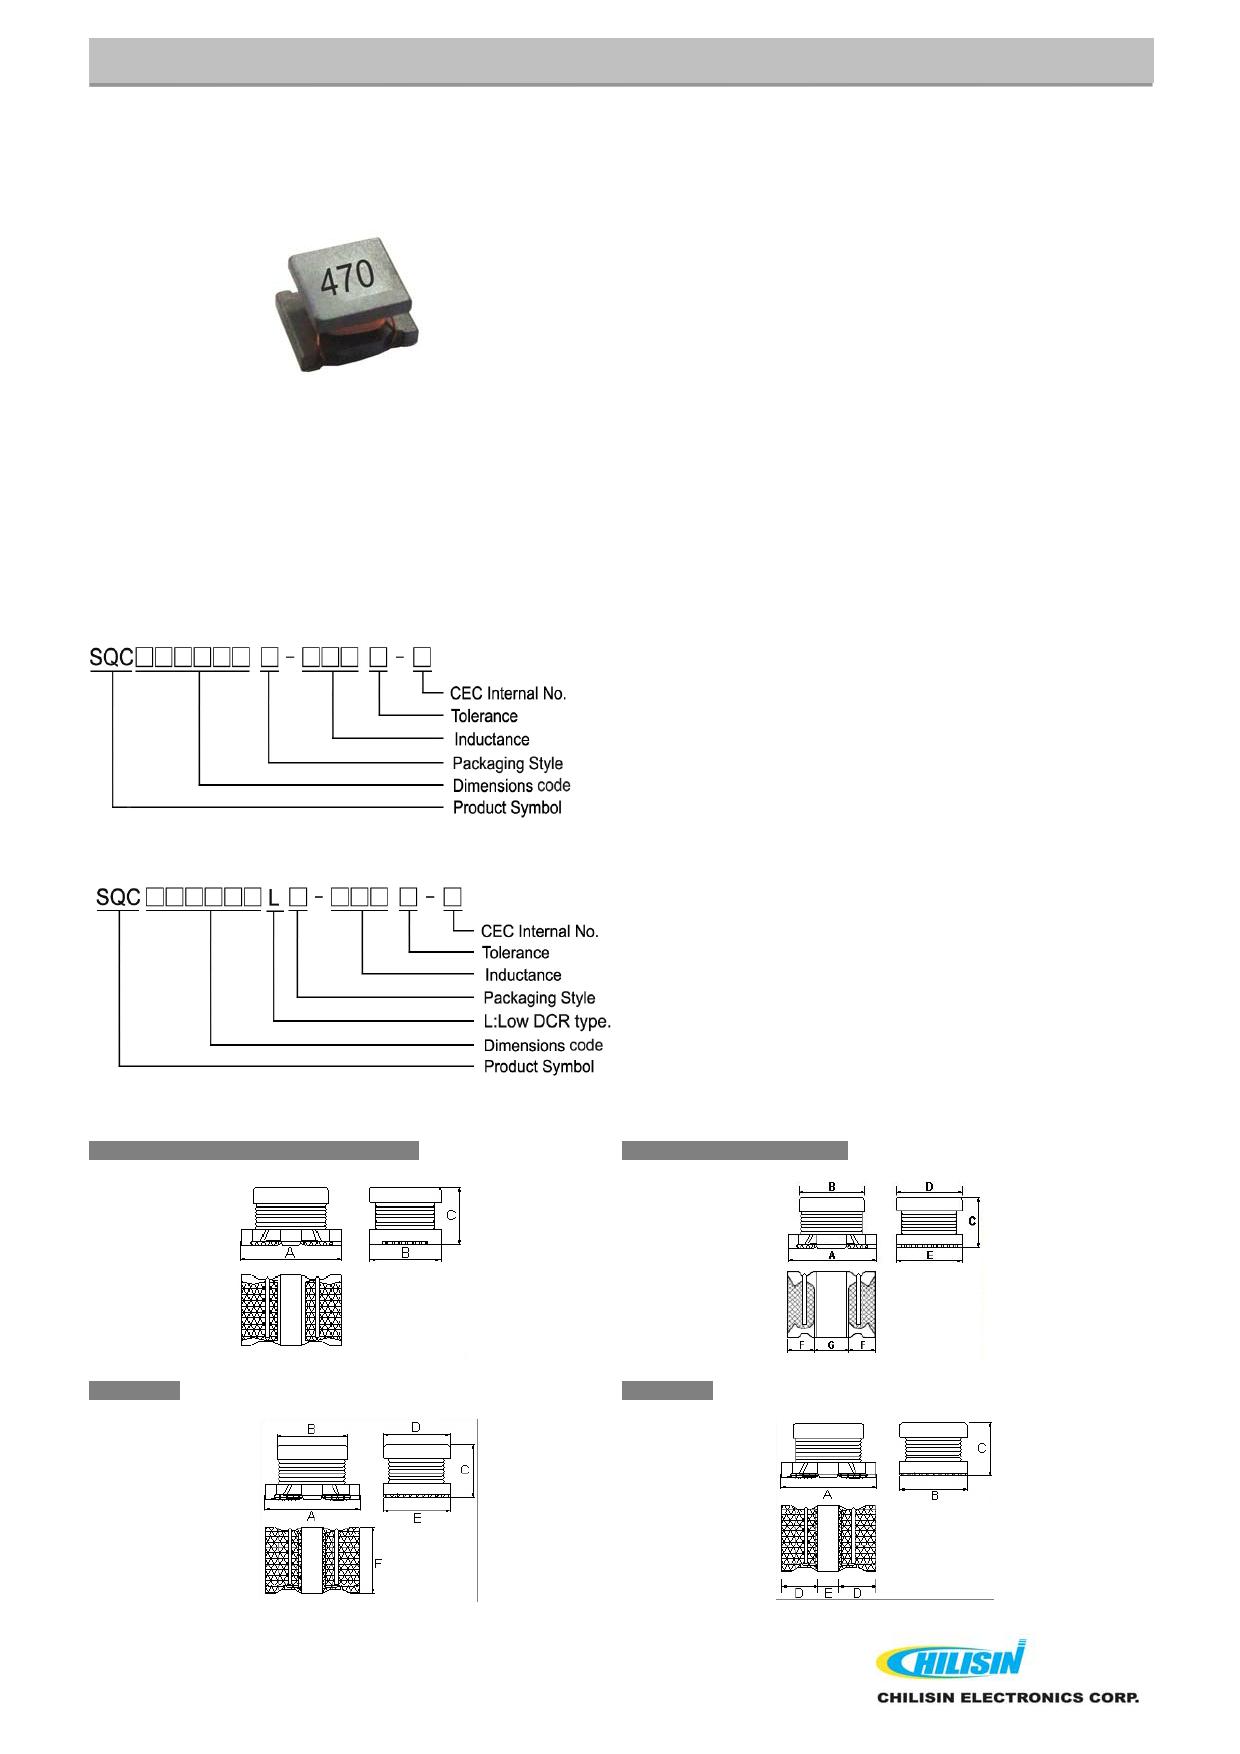 SQC322520LT 데이터시트 및 SQC322520LT PDF